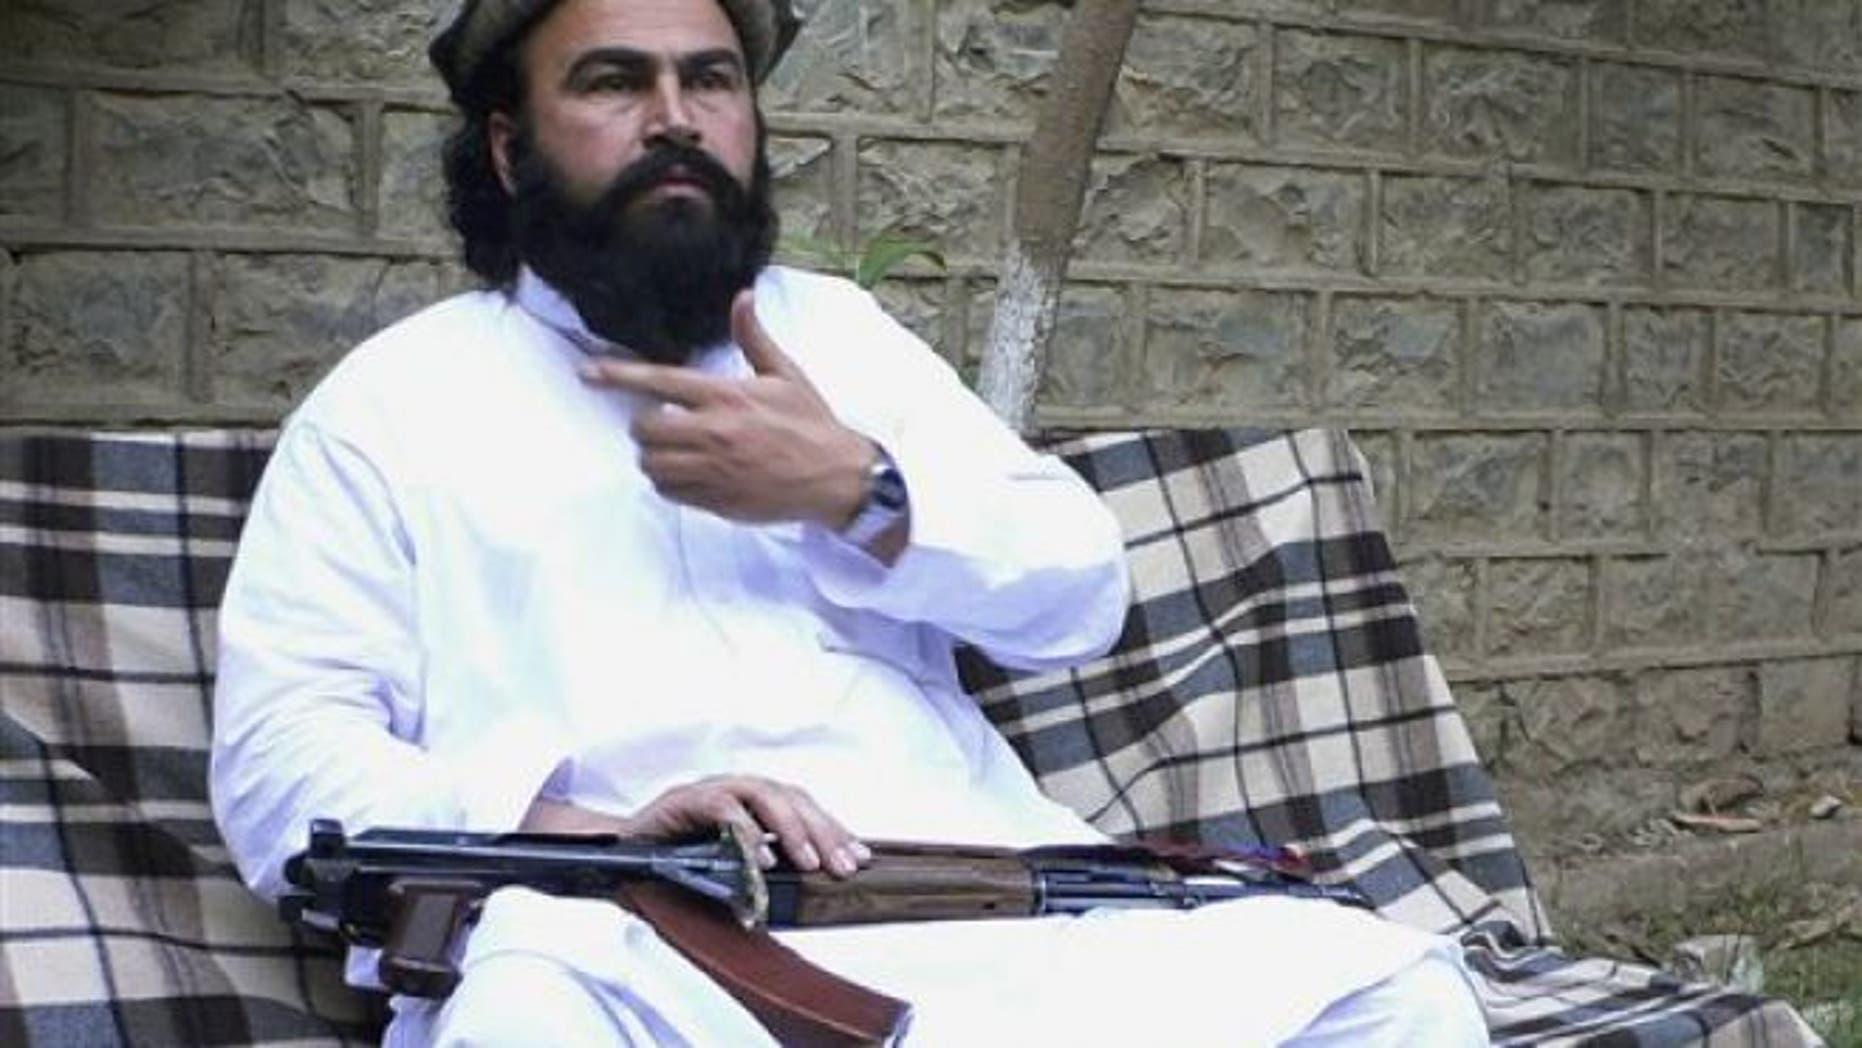 May 16, 2011: The deputy commander of the Pakistani Taliban Waliur Rehman speaks to The Associated Press in Shaktoi, in Pakistani tribal area of South Waziristan along the Afghanistan border.